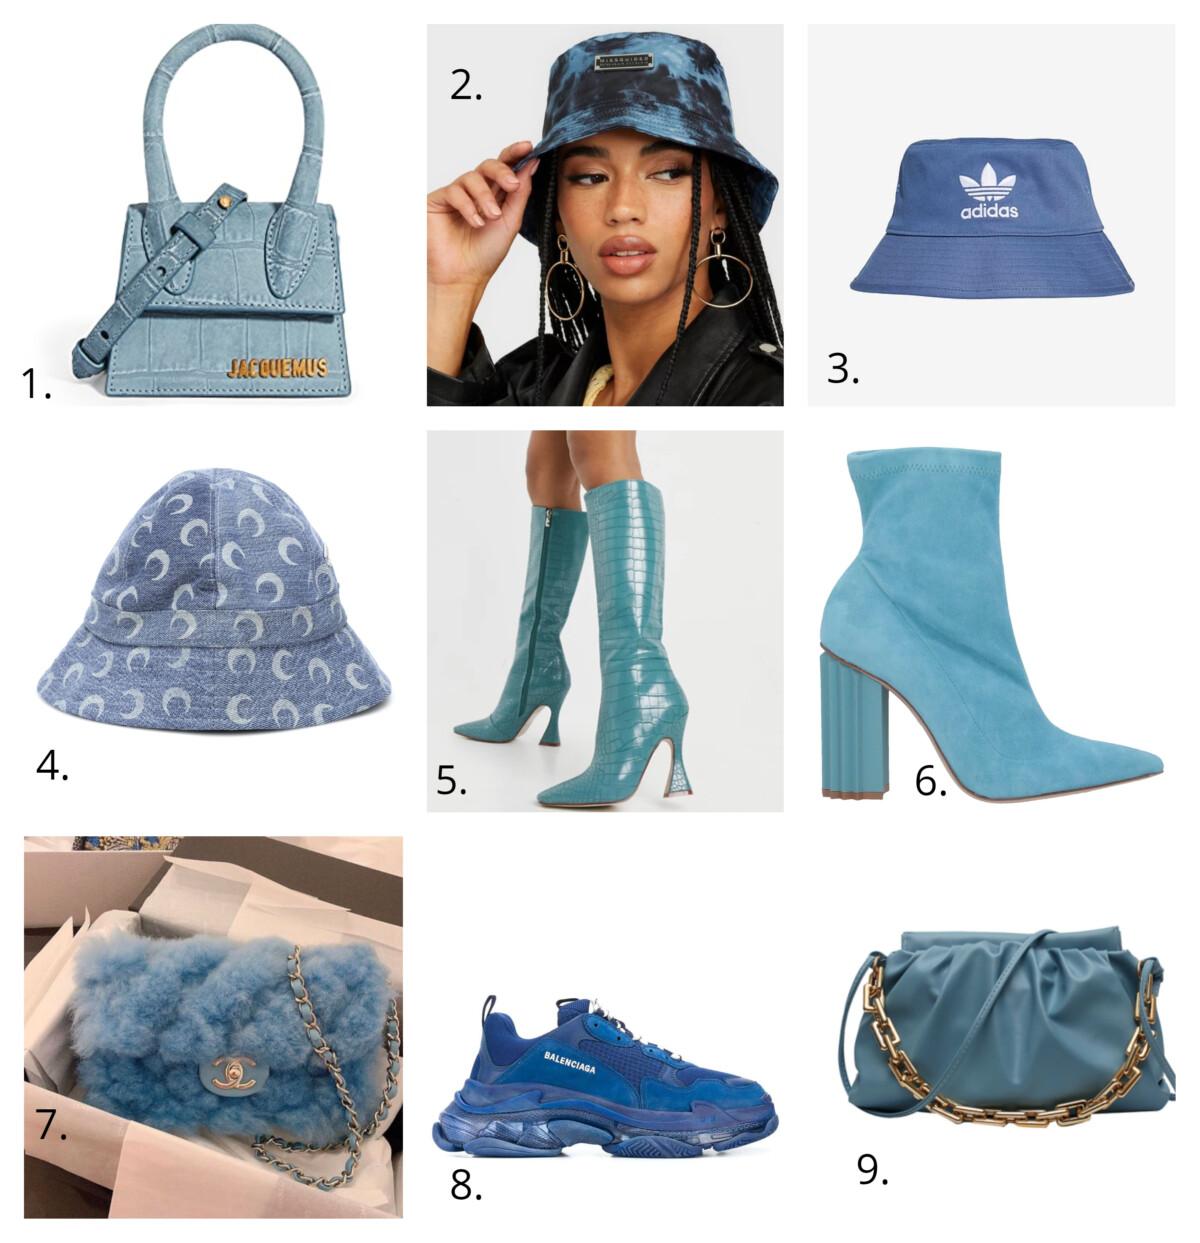 mote-trend-stil-fashion-style-trend2021-trendvårsommer-trendvårsommer2021-SS21-springsummerfashion2021-vårsommertrend2021-trend21-vårsommermote21-stil-antrekk-outfit-catwalk-trender-motetrender-isalicious-